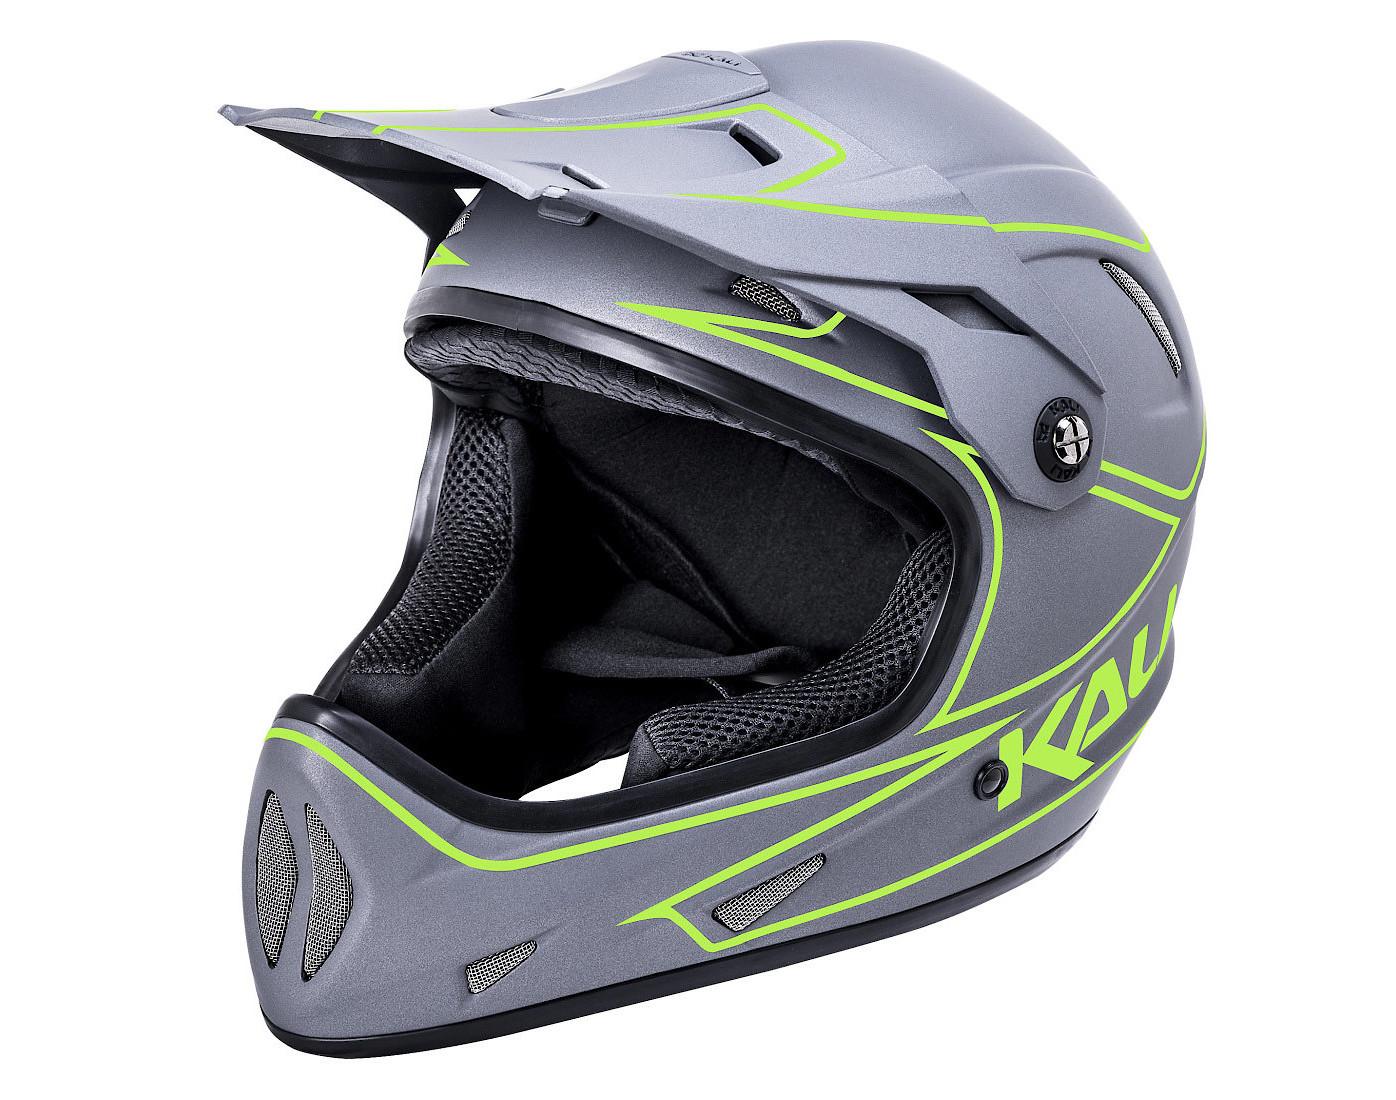 Kali Protectives Alpine Full Face Helmet